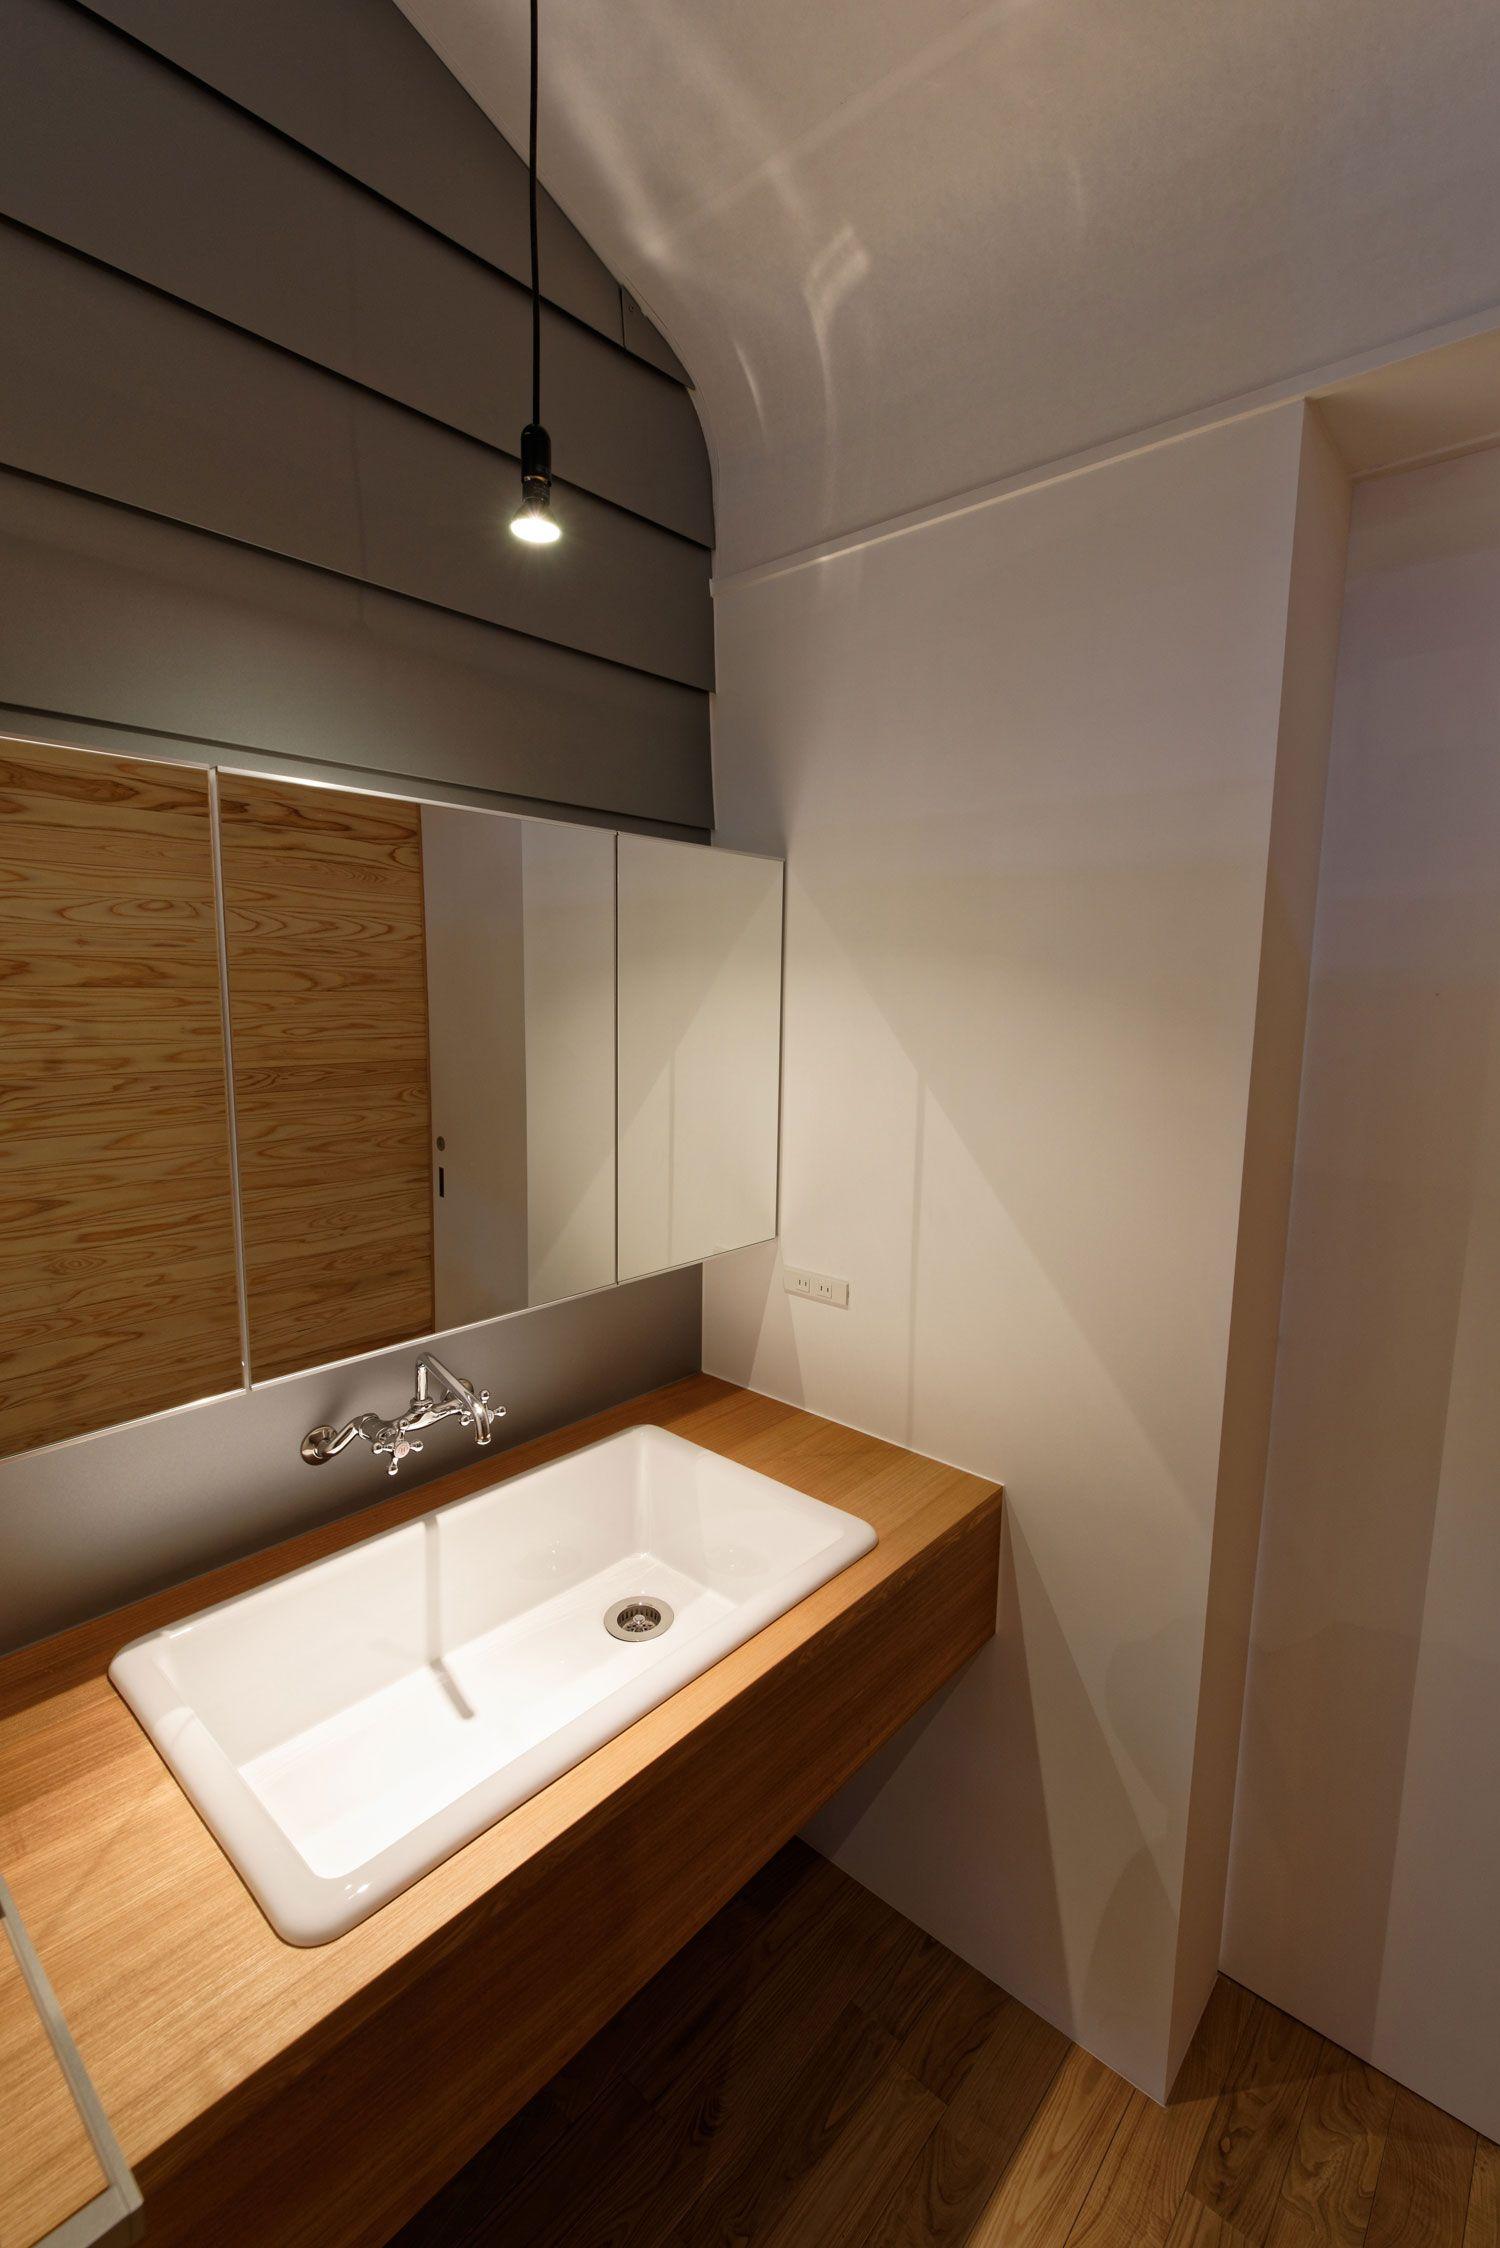 A C E 波多野一級建築士事務所 波多野崇による 京都市上京区の築